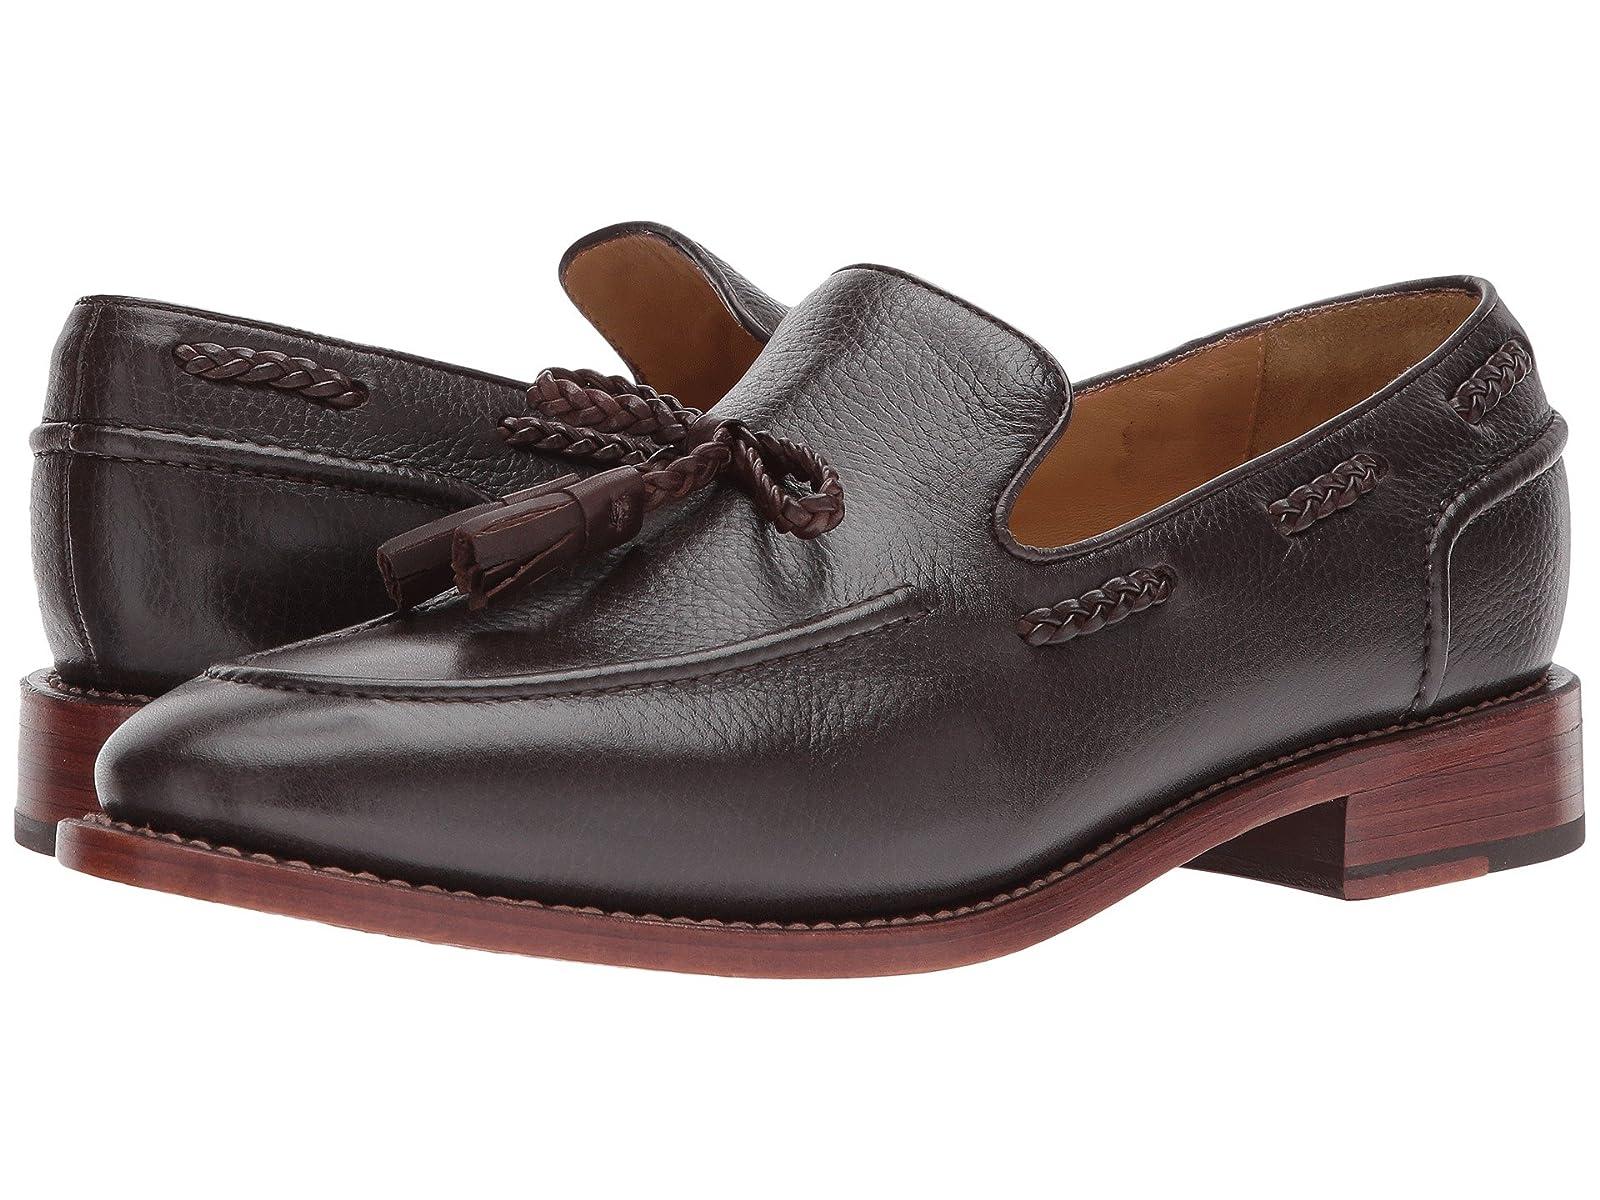 Michael Bastian Gray Label Michael Bastian LoaferCheap and distinctive eye-catching shoes